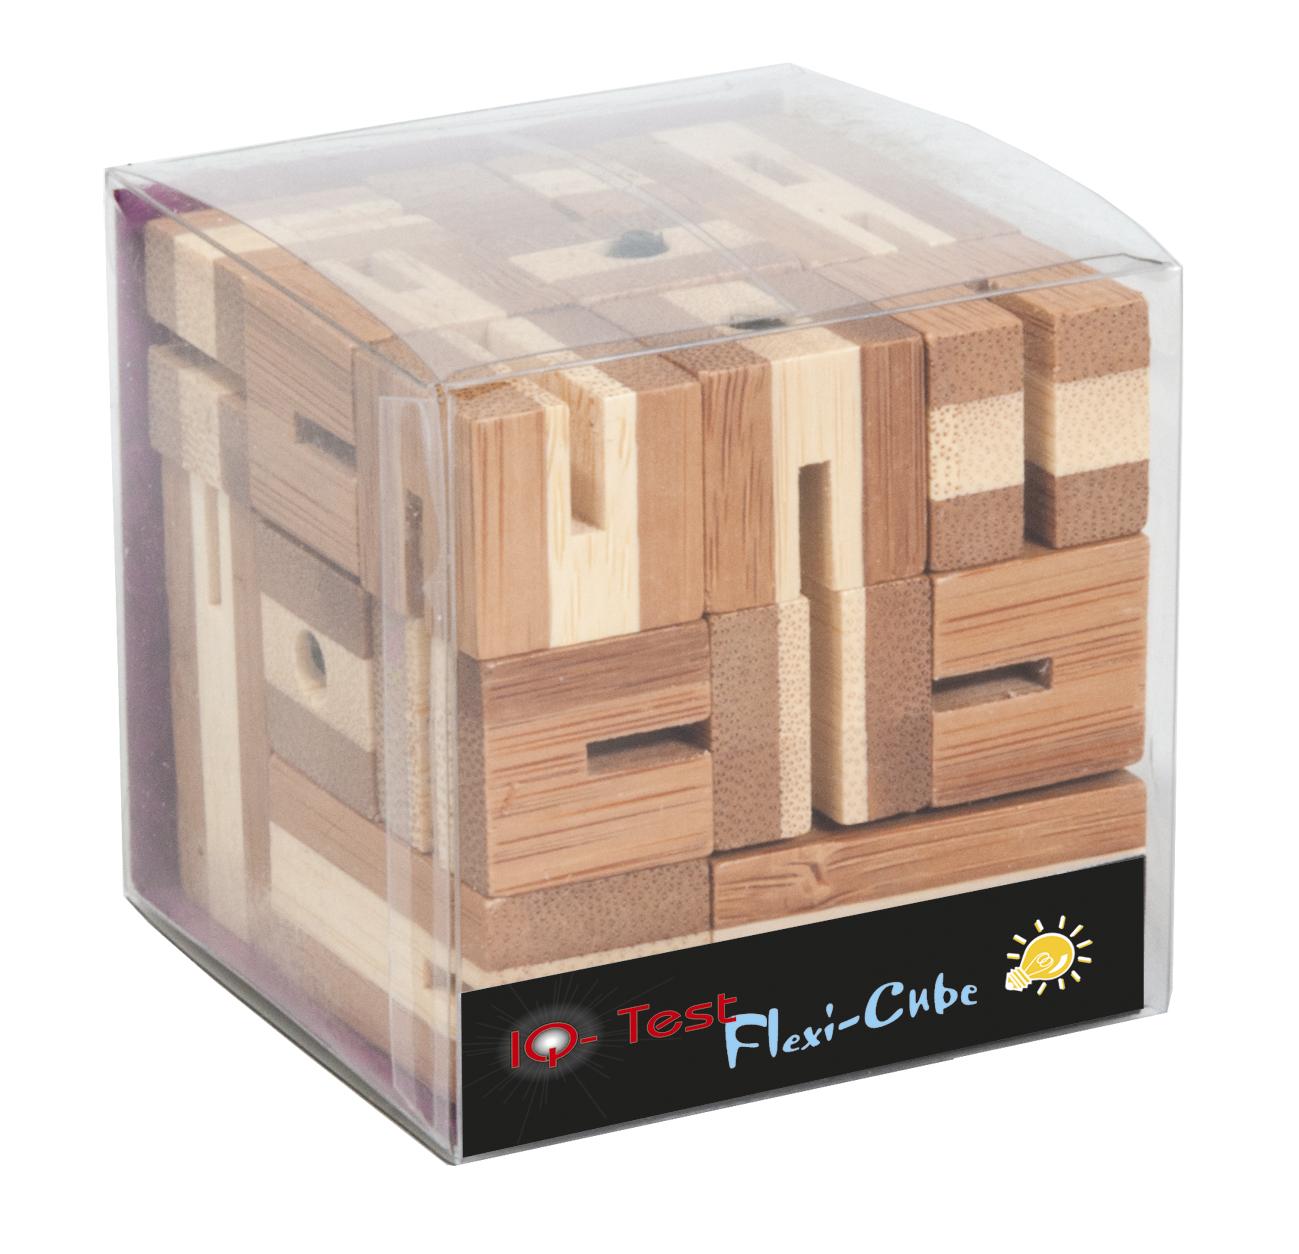 Joc logic puzzle 3d din bambus flexi-cub 3 fridolin